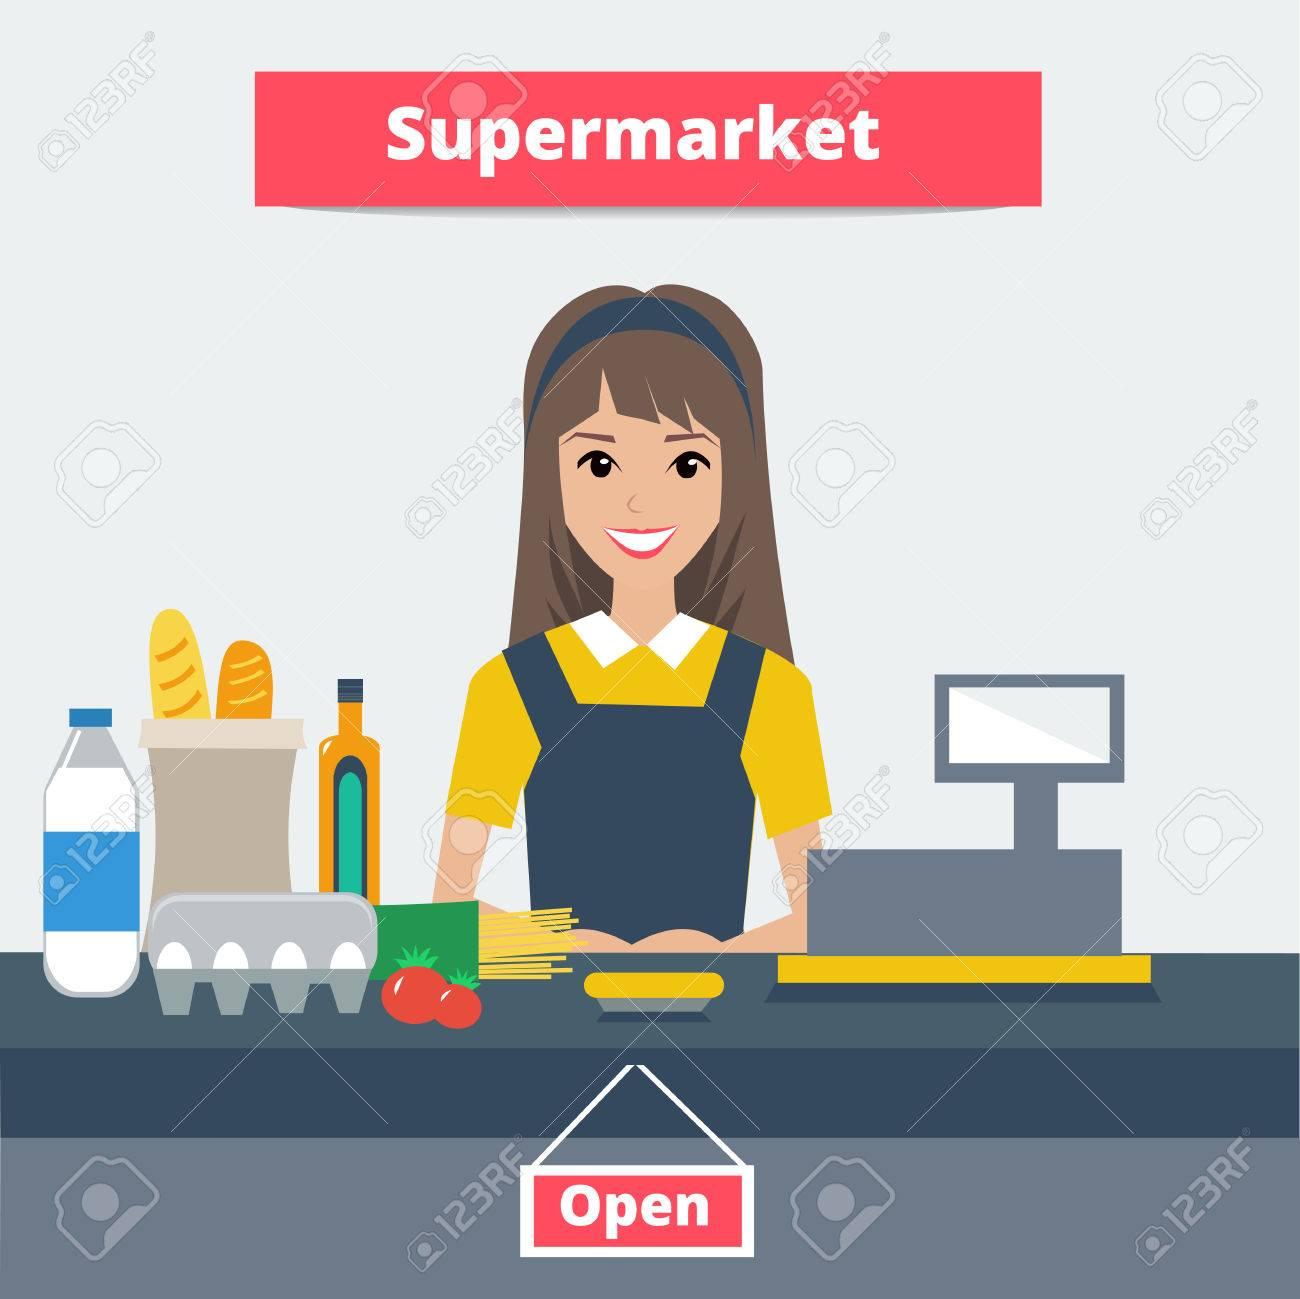 clip download Supermarket clipart casher. Cashier portal